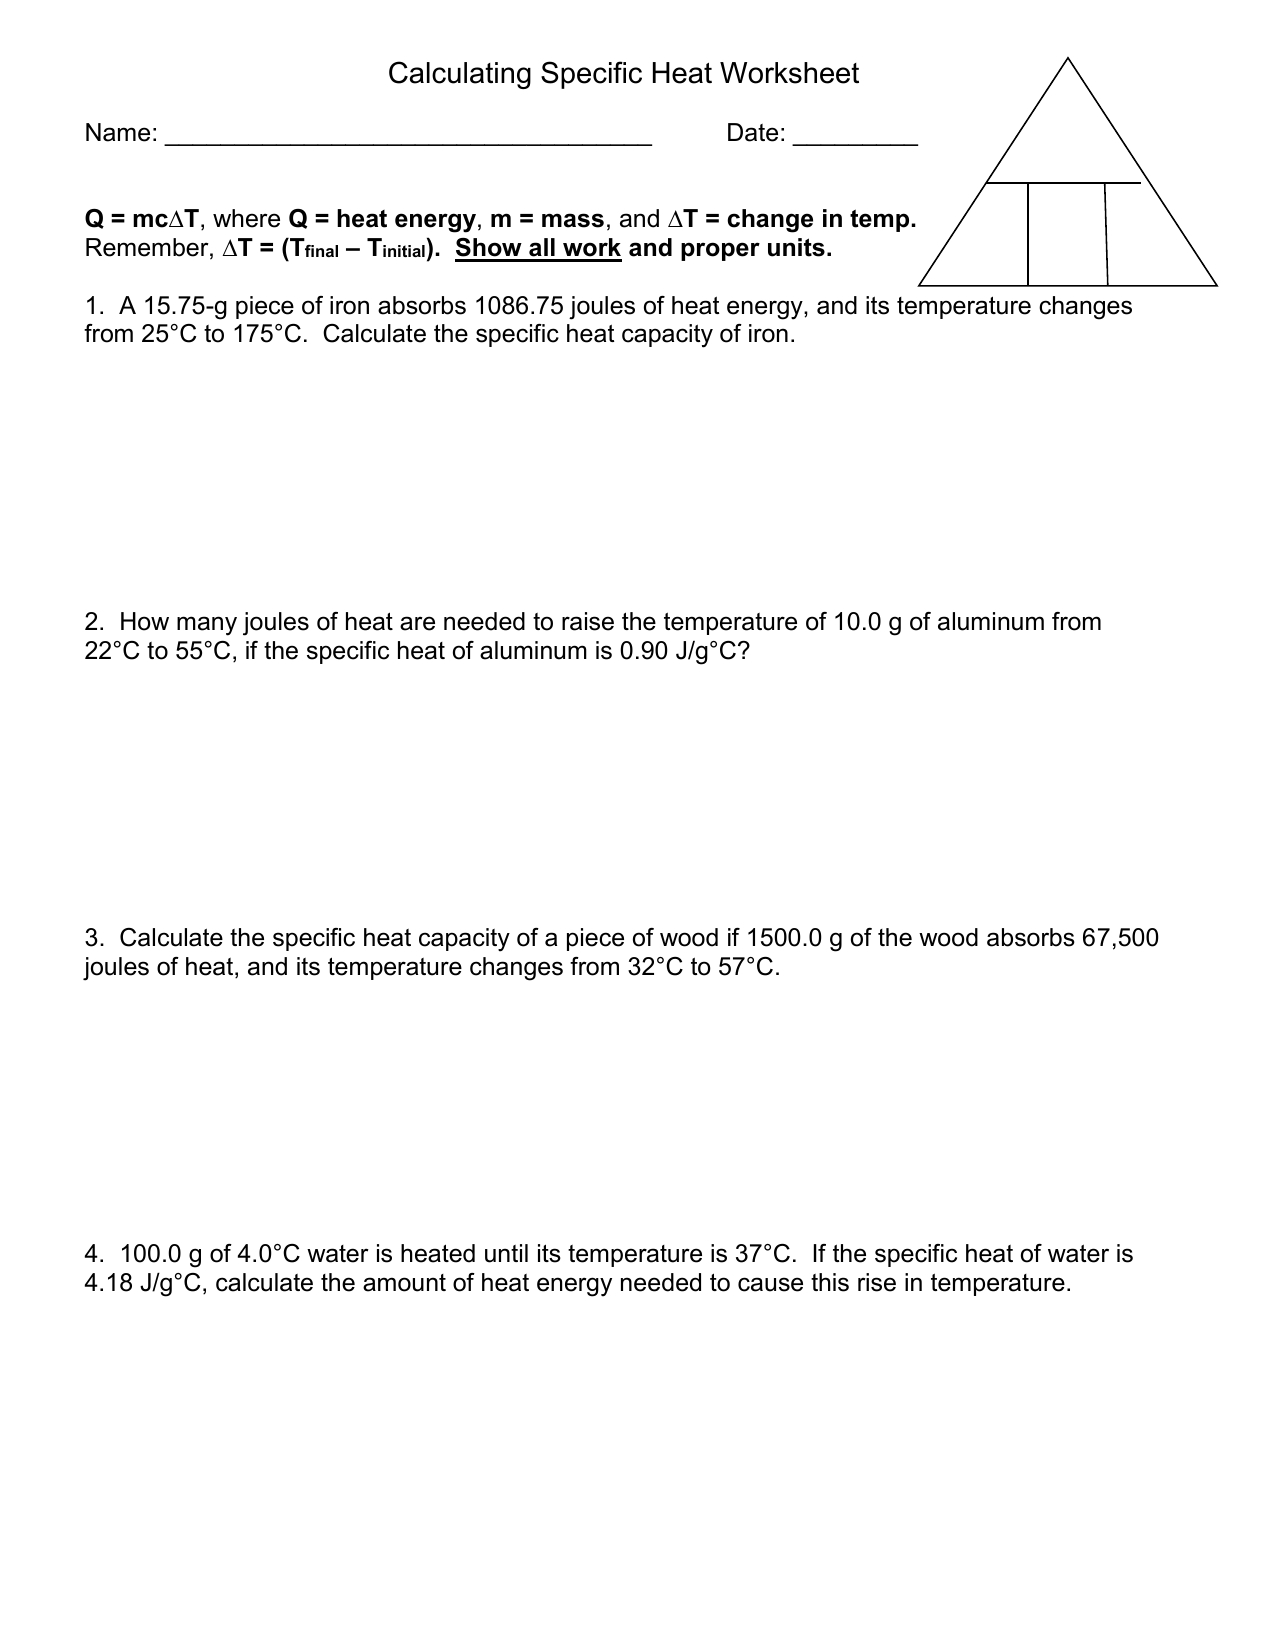 Specific Heat Worksheet Also Specific Heat Calculations Worksheet